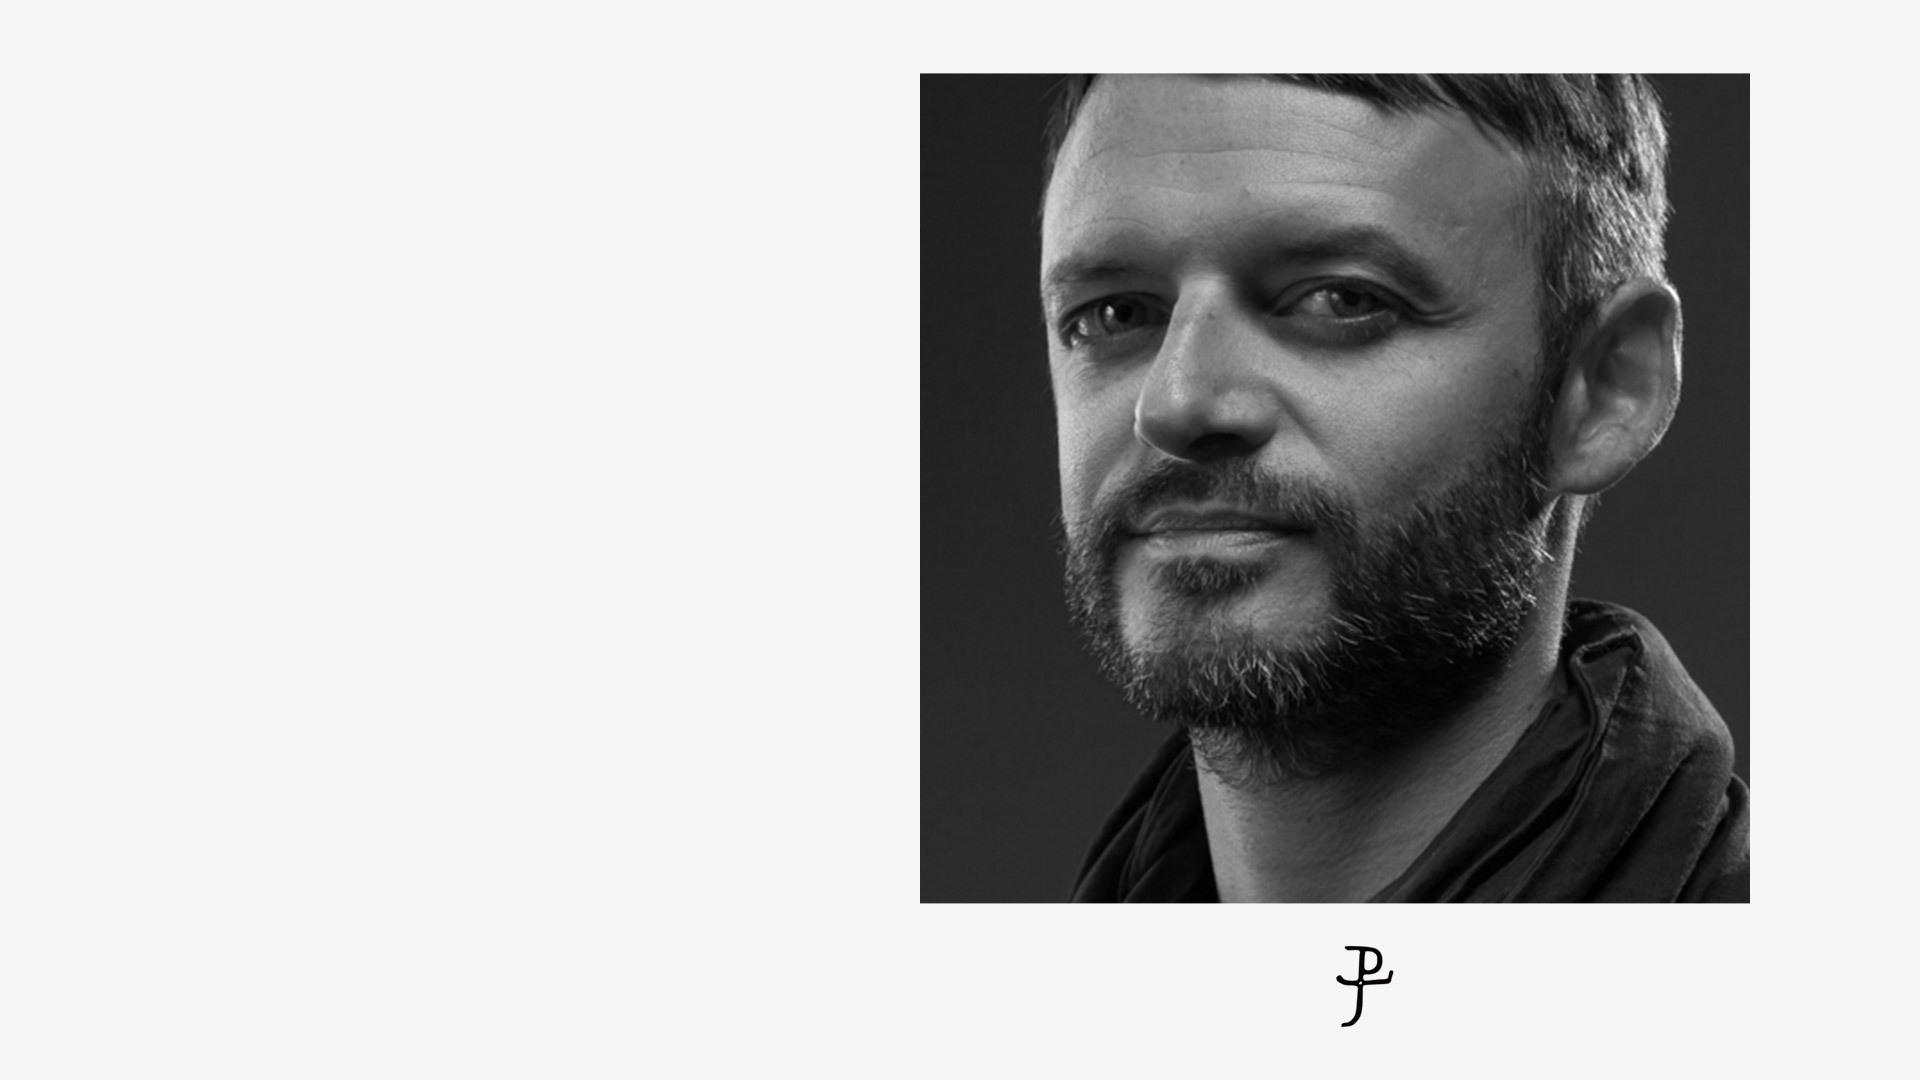 Julien Palast <br/>巴黎最热静物摄影师